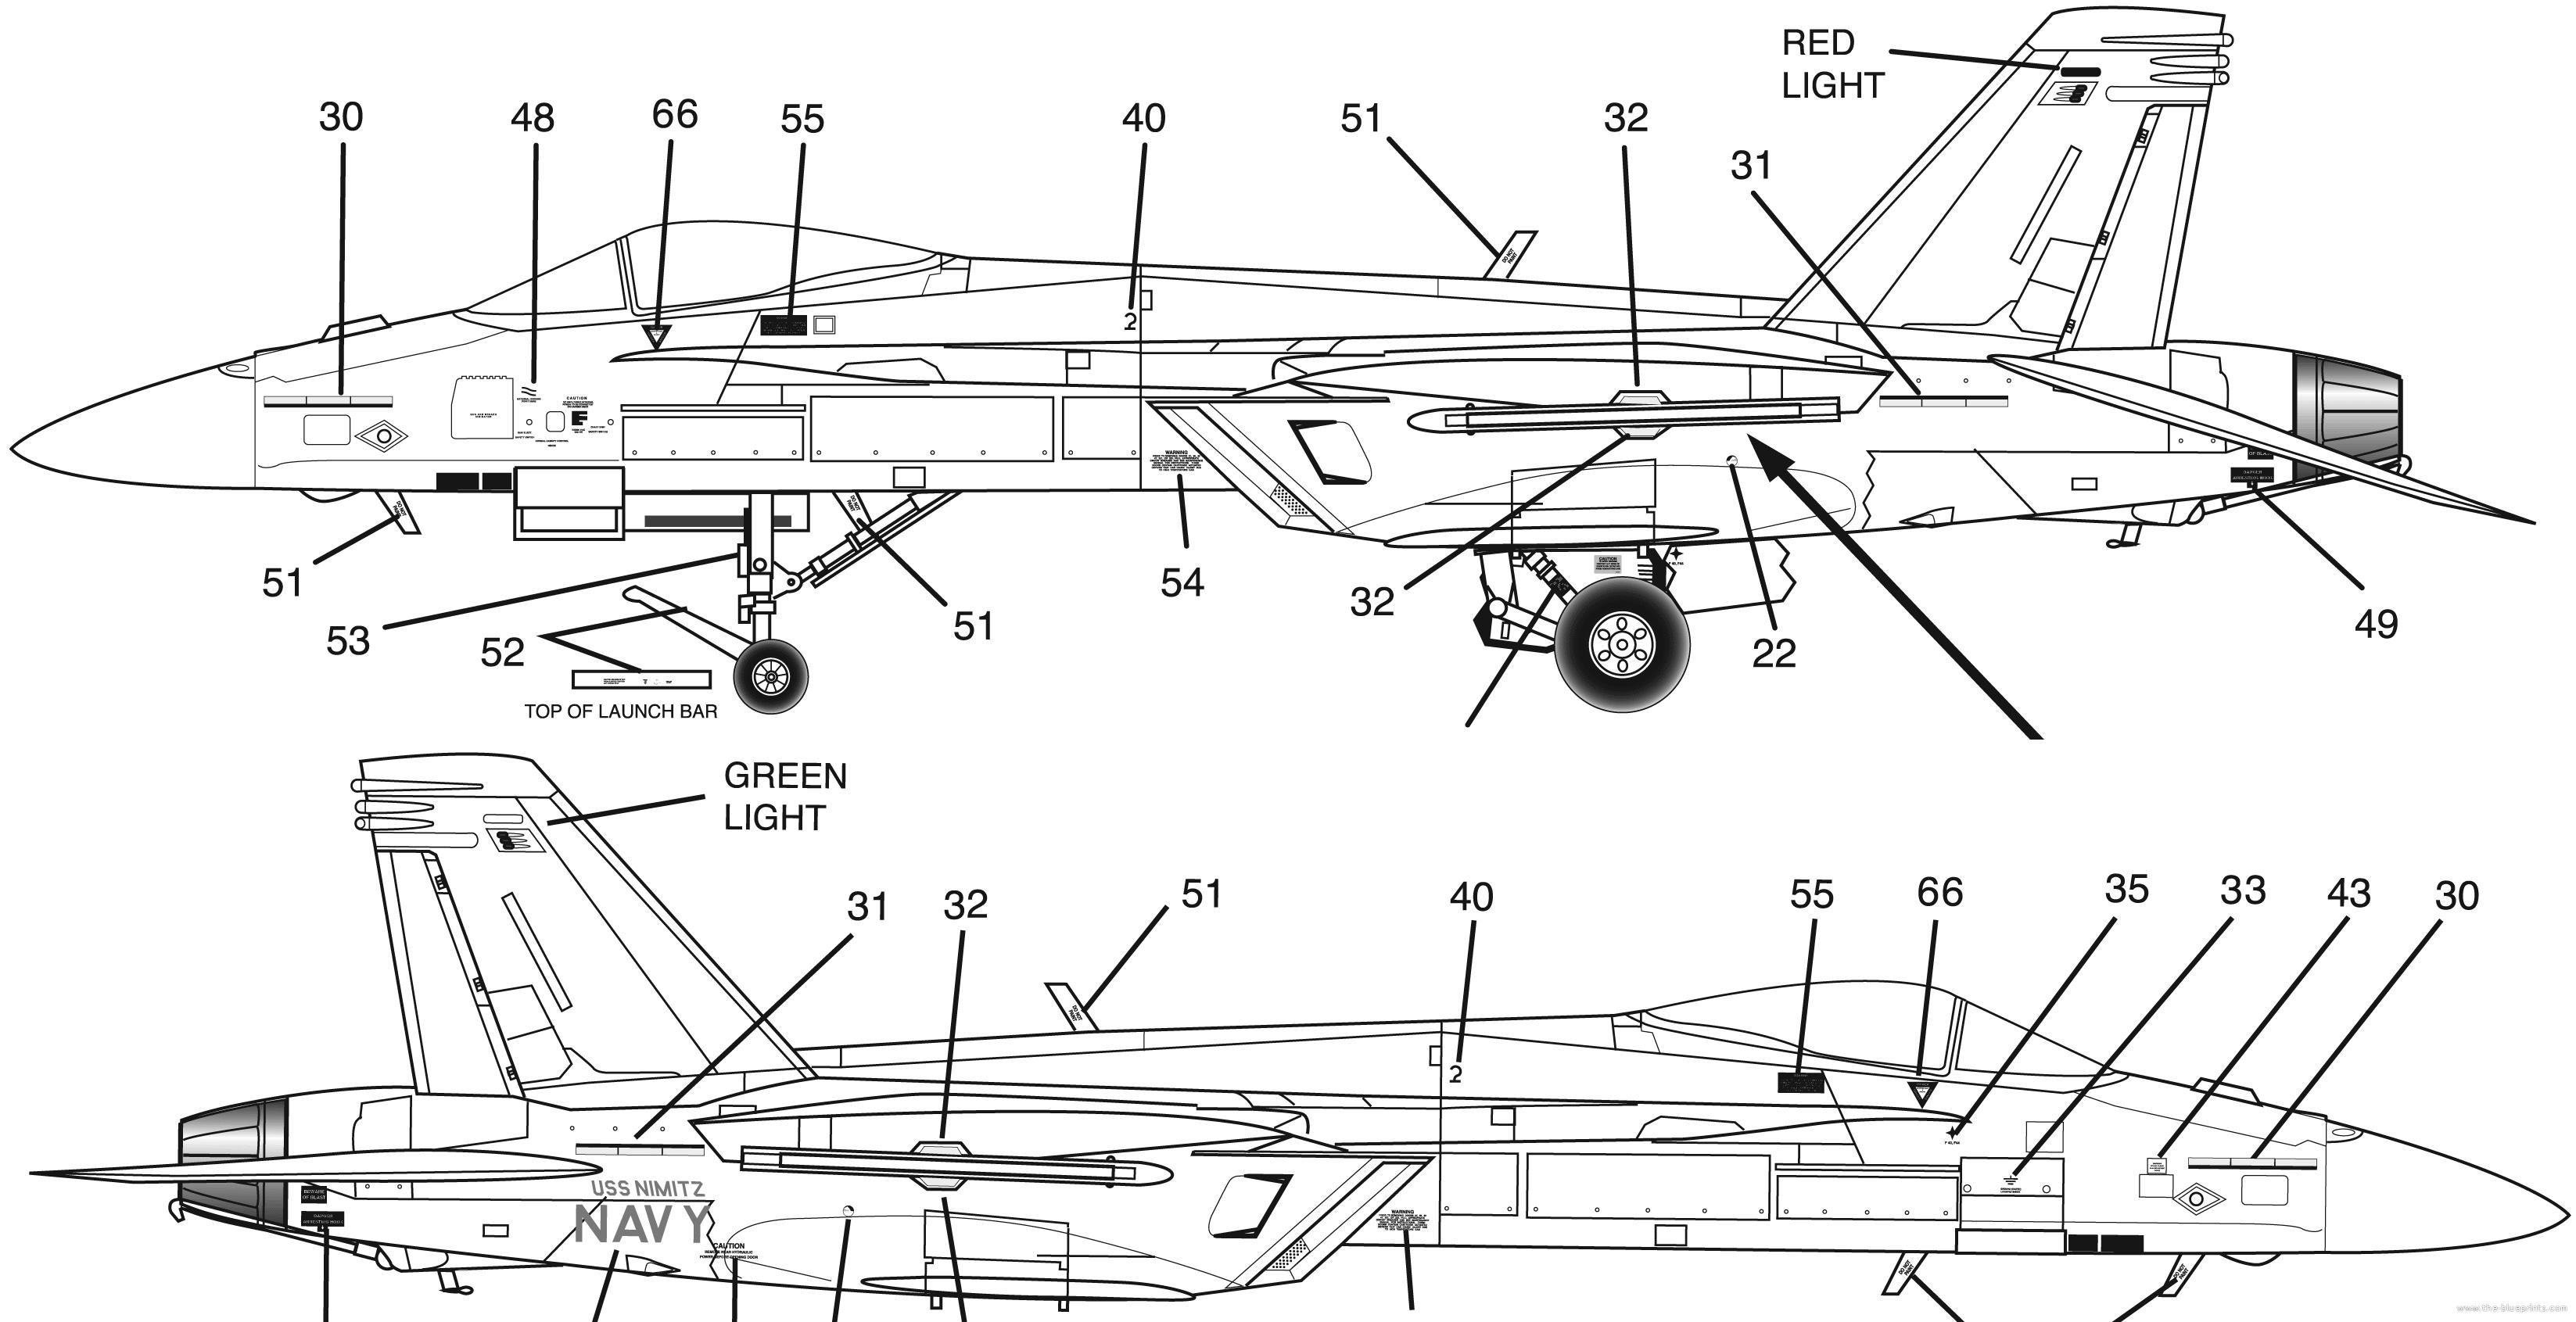 f a 18e super hornet 2 blueprints \u003e modern airplanes \u003e mcdonnell douglas \u003e mcdonnell